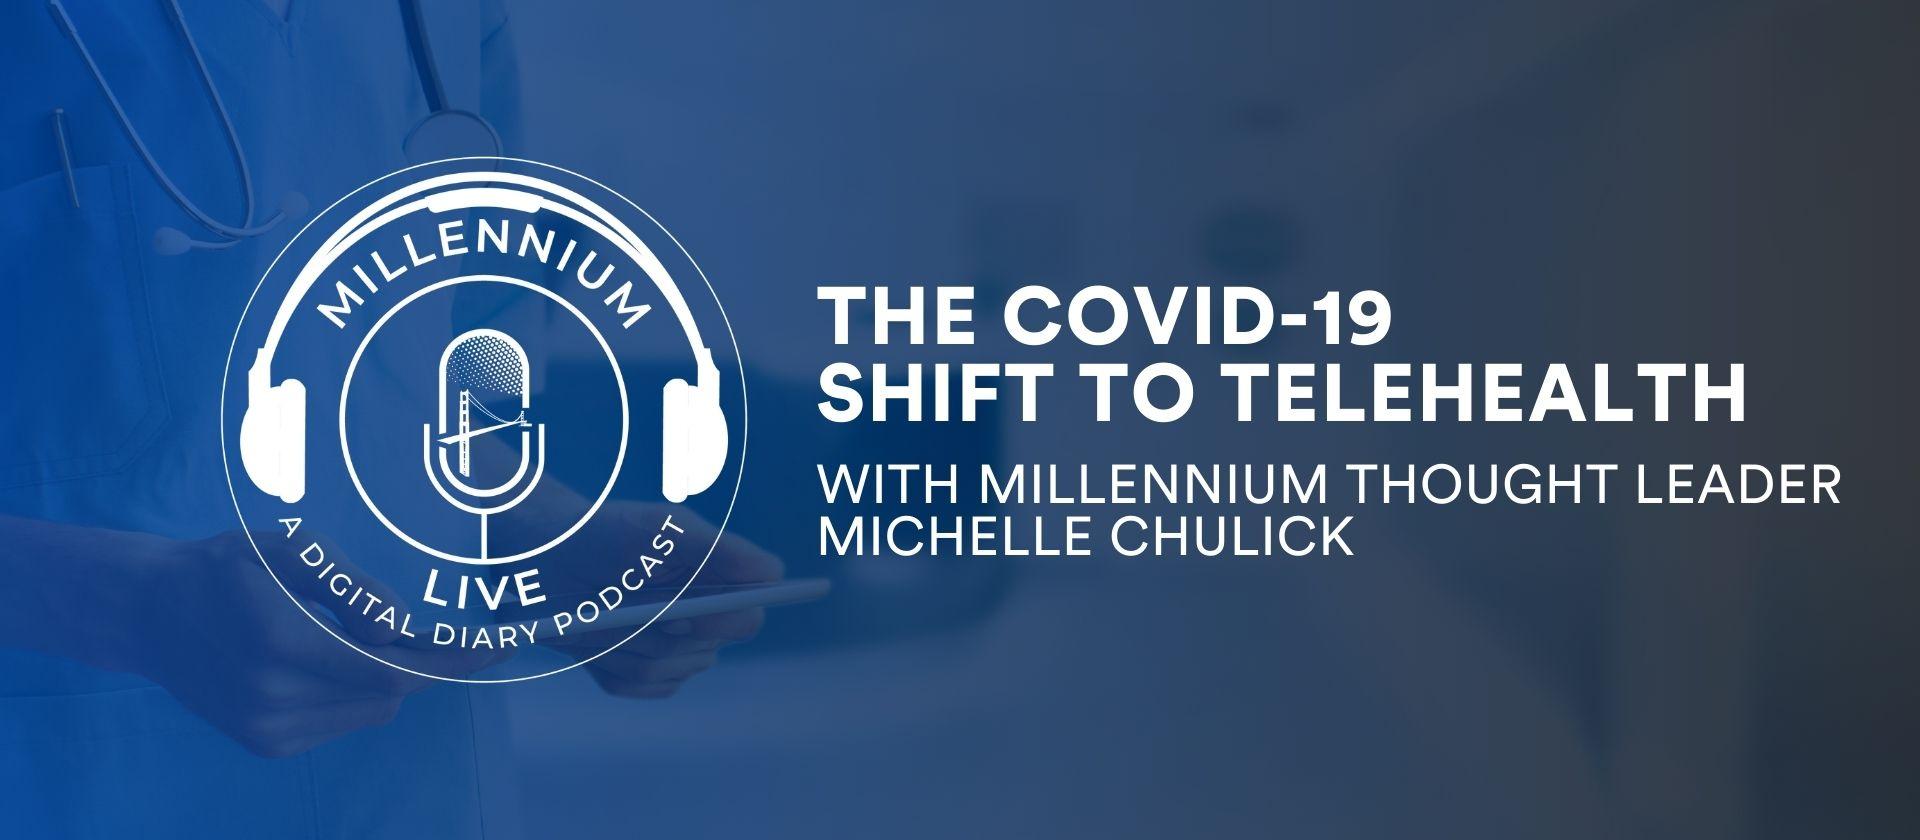 The COVID-19 shift to telehealth